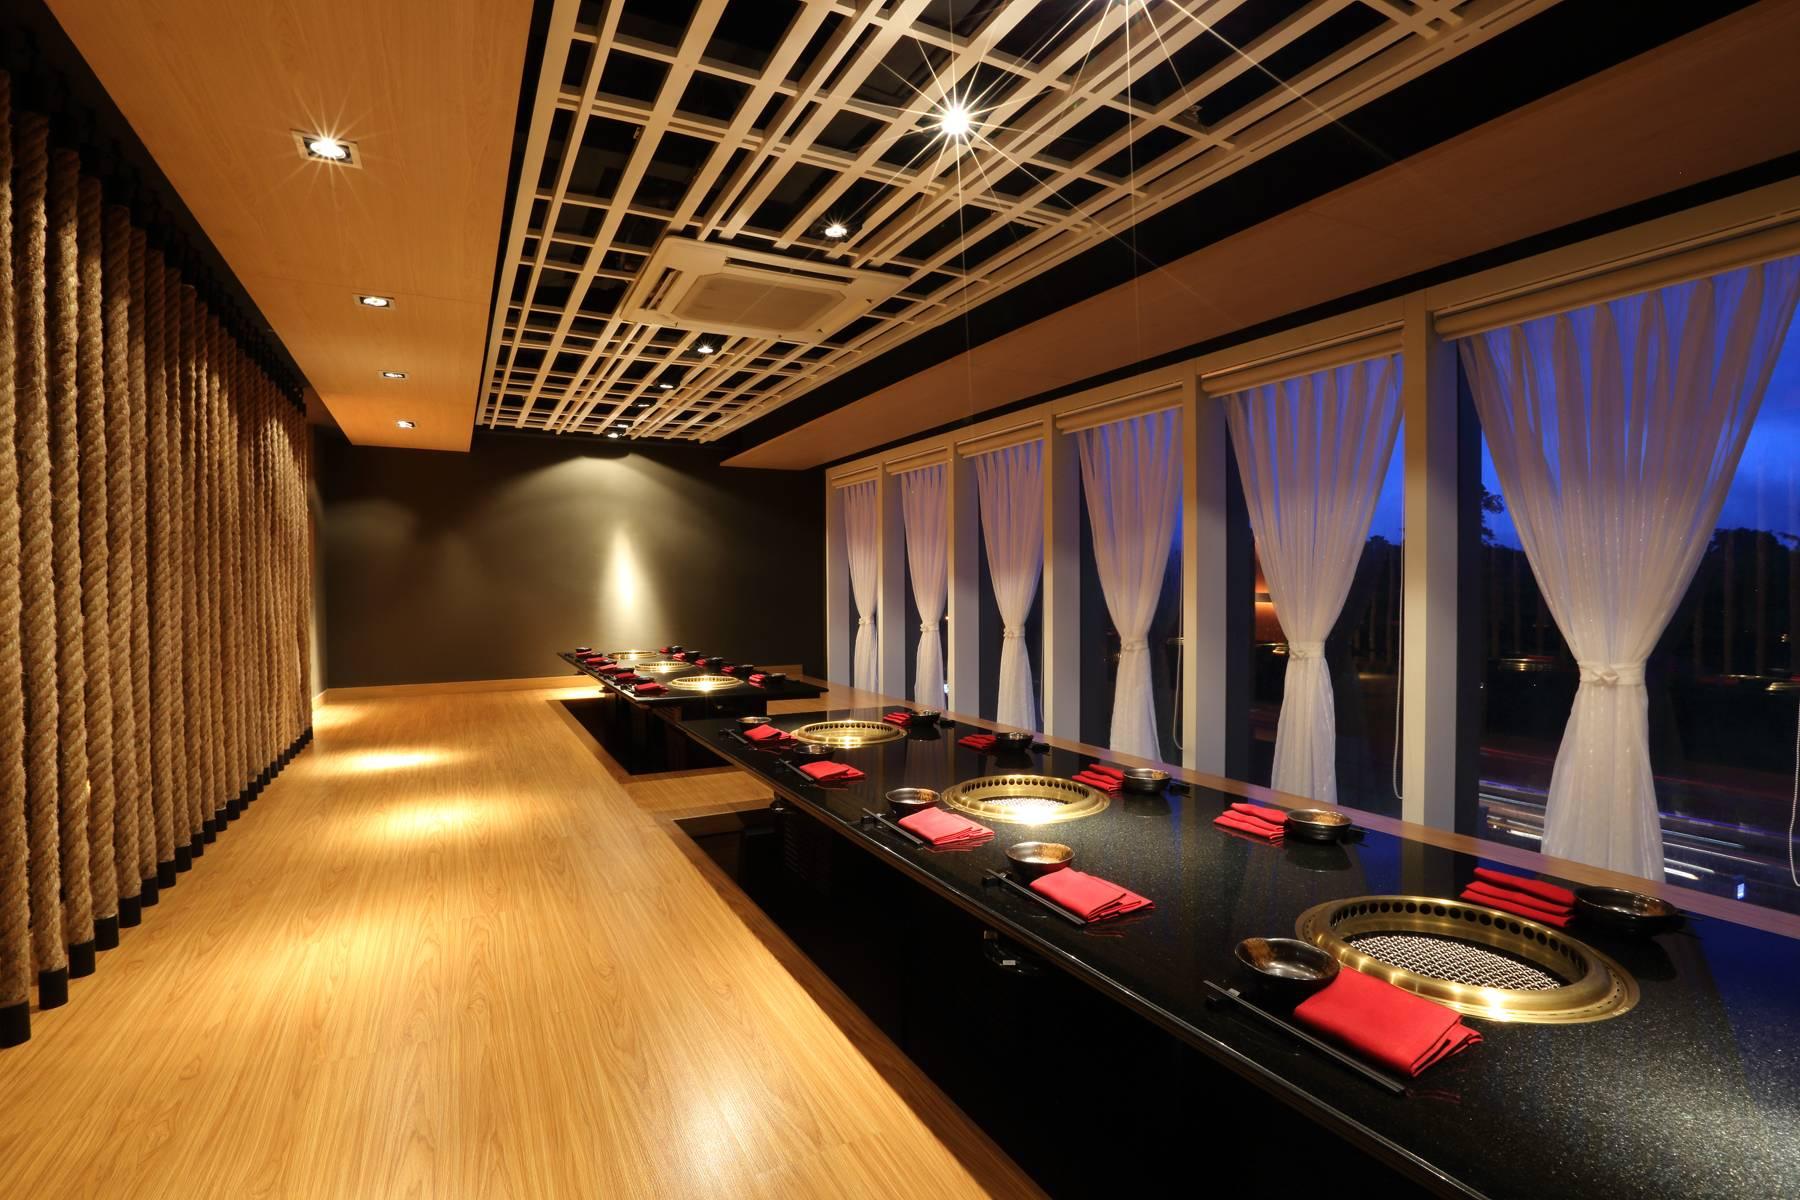 takumi-ya-japanese-restaurant